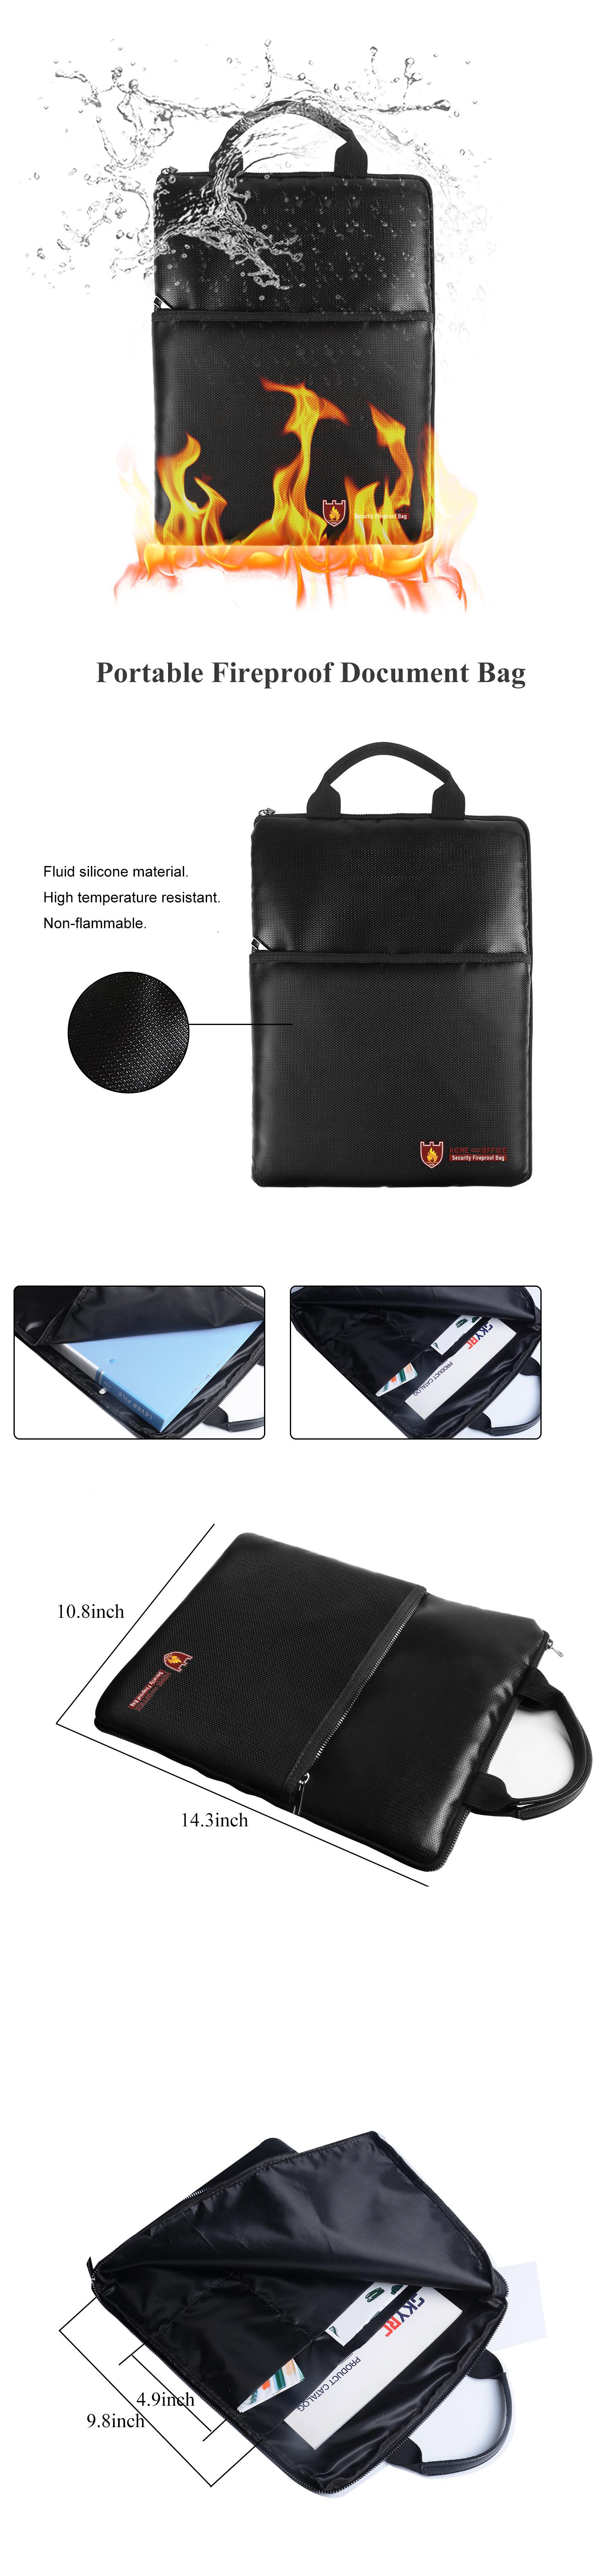 IPRee® Fireproof Document Safe Handbag Waterproof Business Briefcase Money Folder Holder Storage For Bank Cards Passport Cash